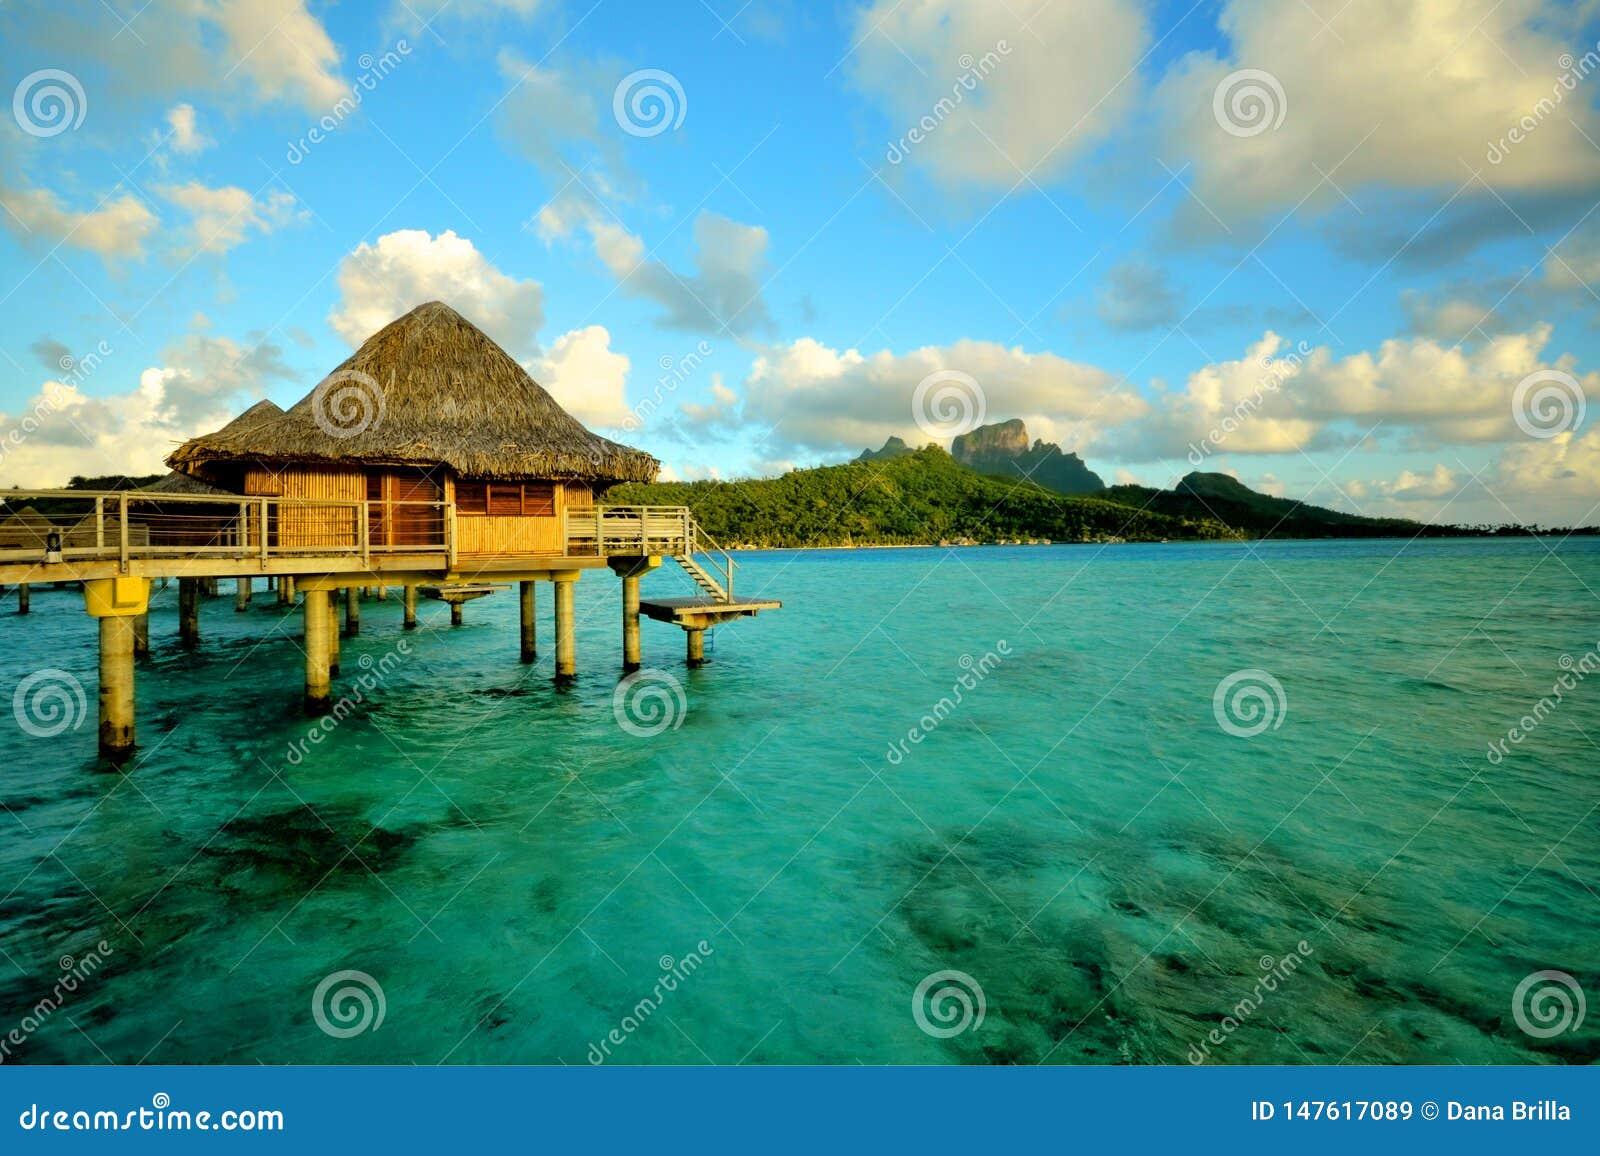 Bora bora over the water bungalow